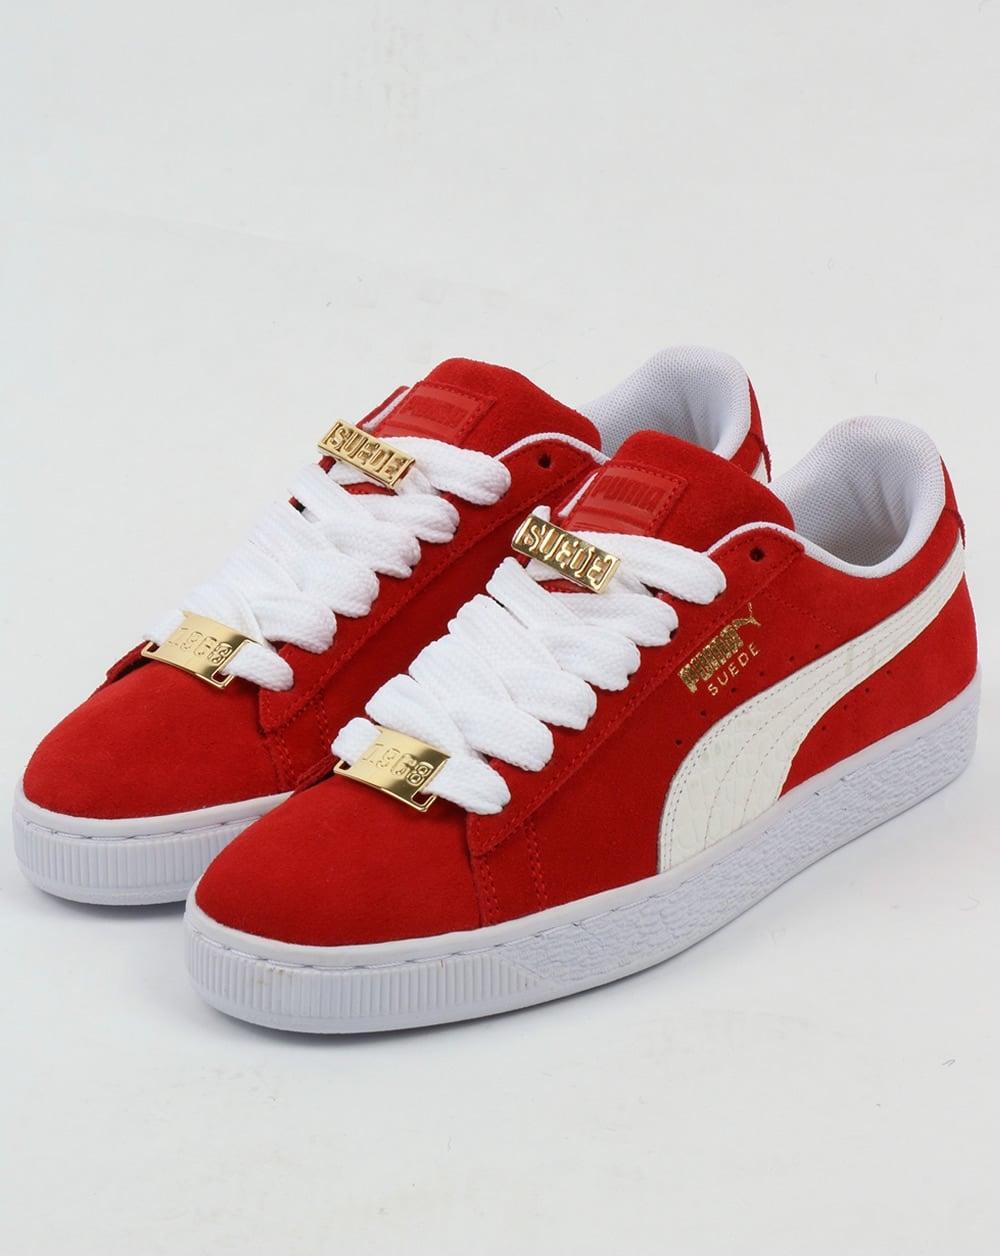 e46aa3bdeeb Puma Chaussures Suede Classic Bboy Fabulous Puma soldes xbZvzAvnb ...